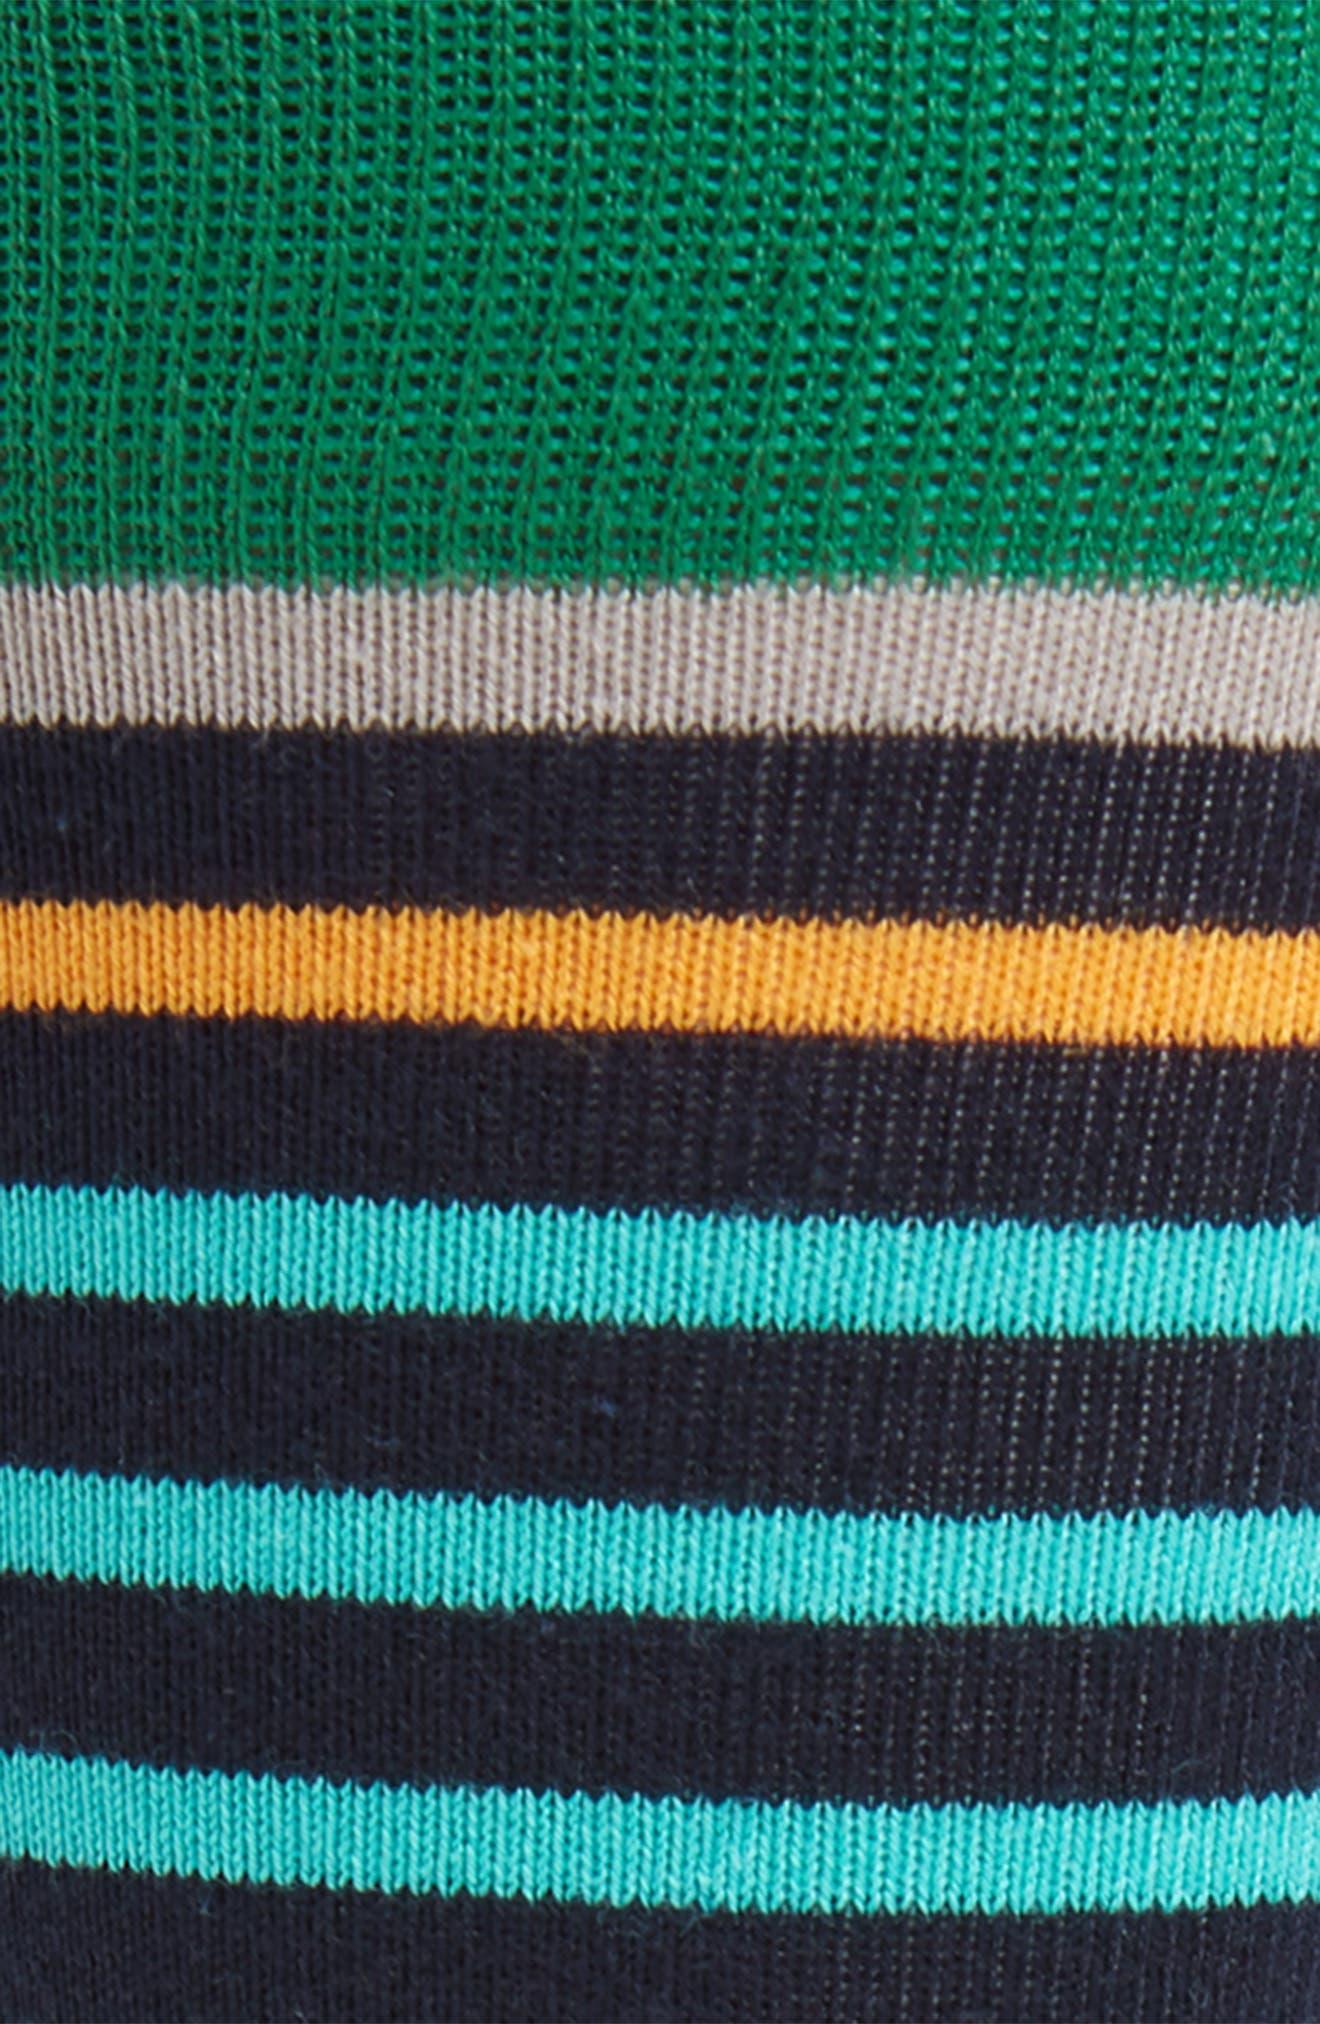 Mojo Striped Socks,                             Alternate thumbnail 2, color,                             GREEN